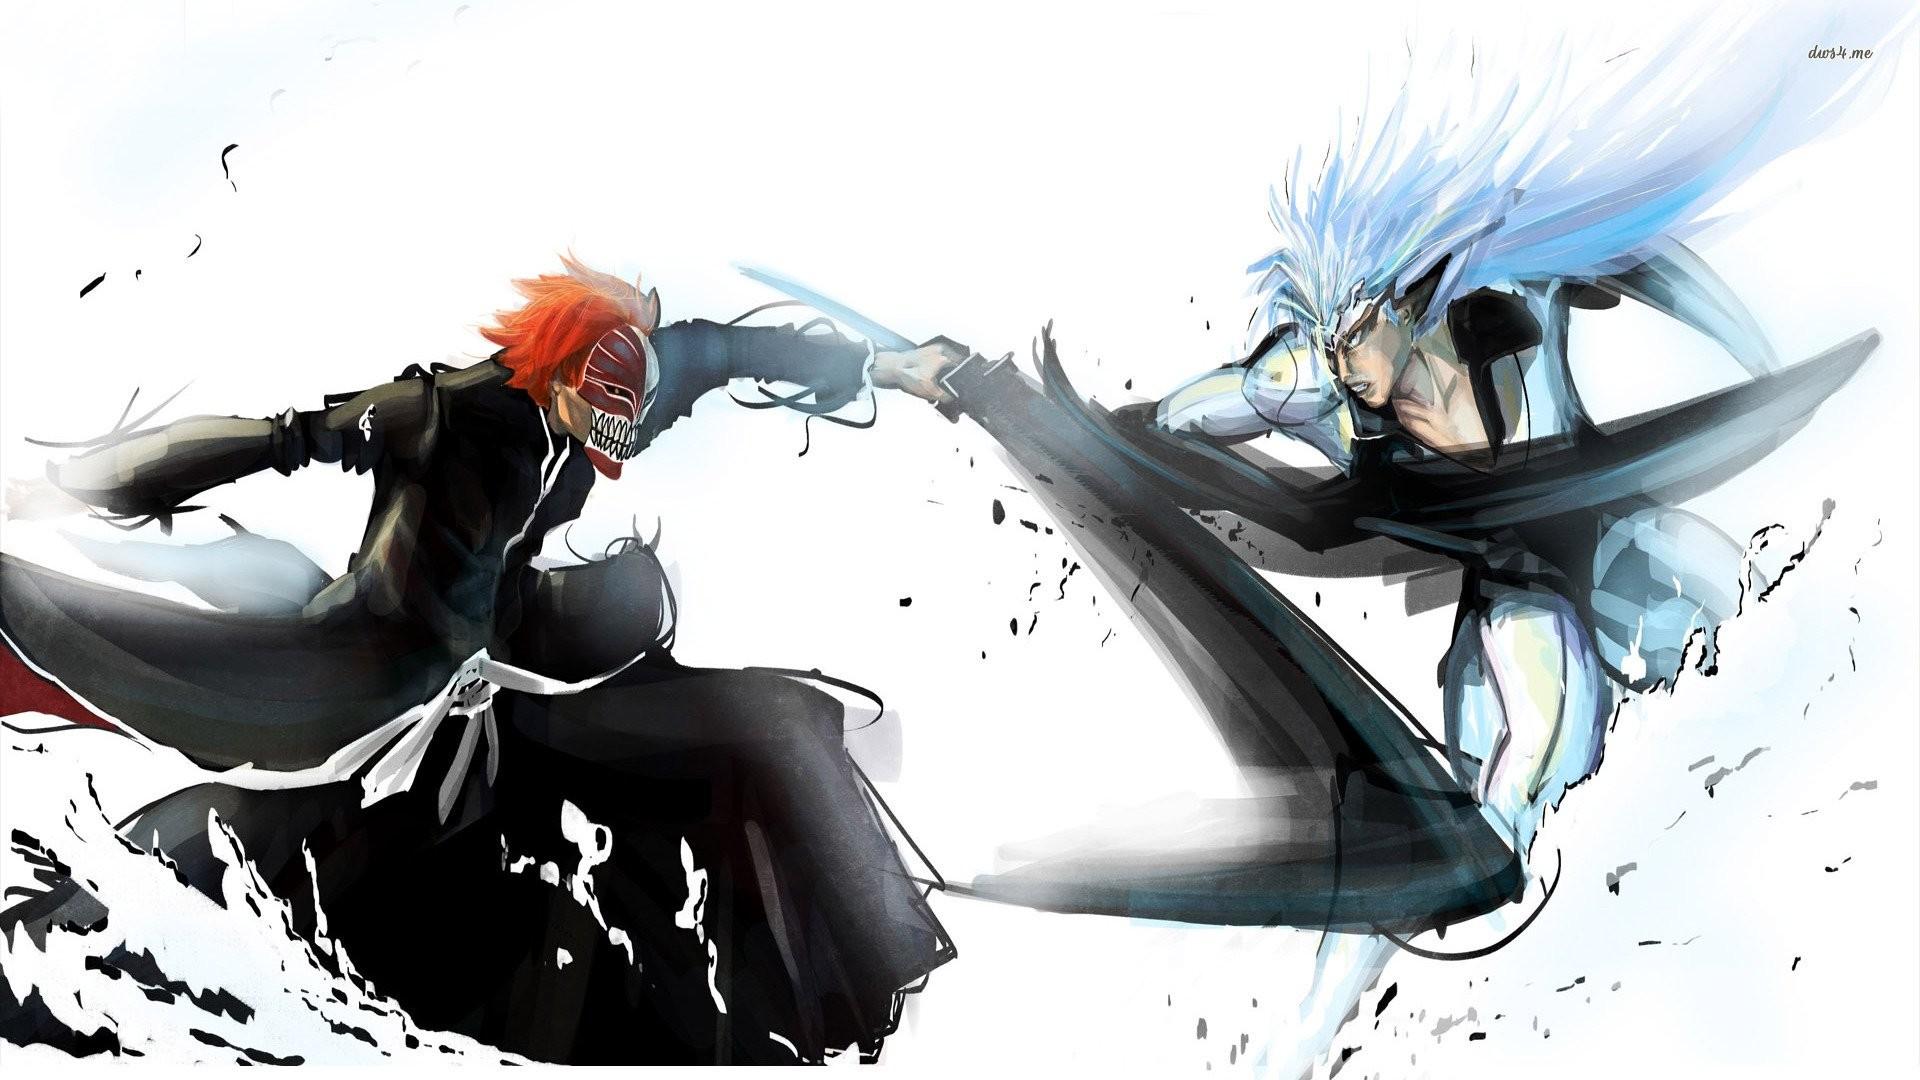 Bleach – Grimmjow Jaegerjaquez x Ichigo Kurosaki – Grimmichi   Grimmjow &  Ichigo   Pinterest   Anime